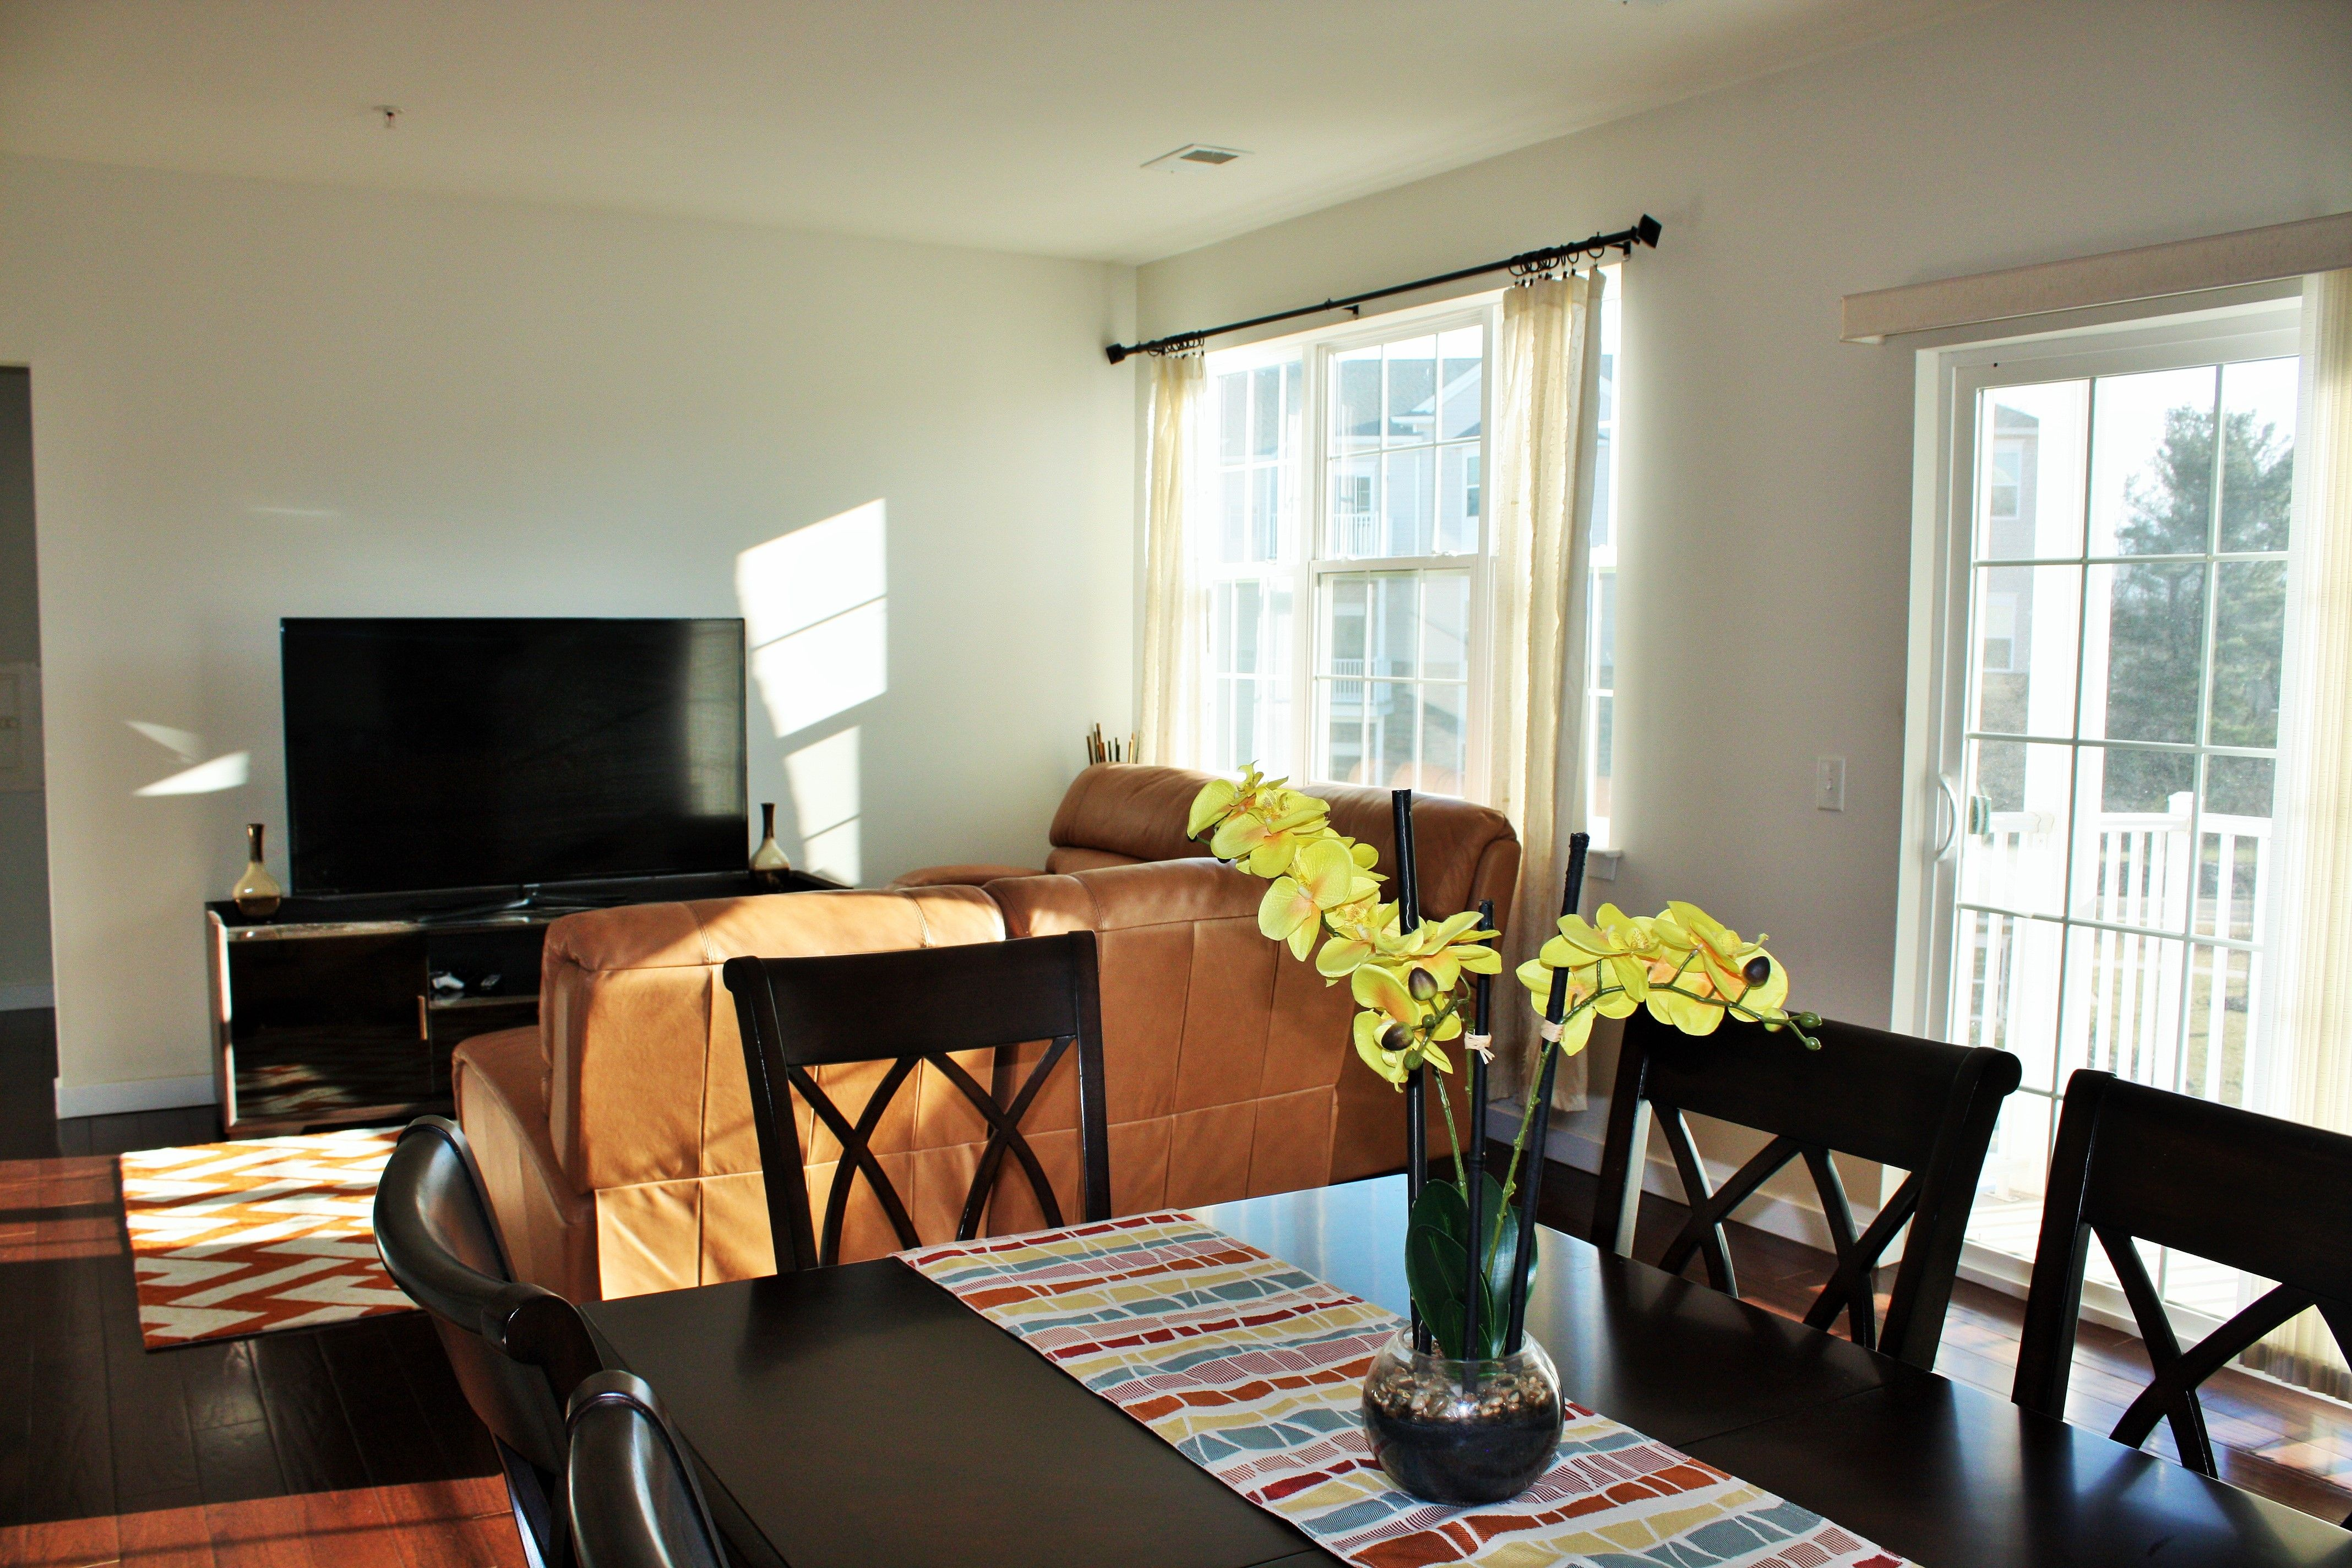 Master bedroom hardwood floors  THREE YEAR YOUNG NEW YORK STYLE CONDO WITH HARDWOOD FLOORS GRANITE